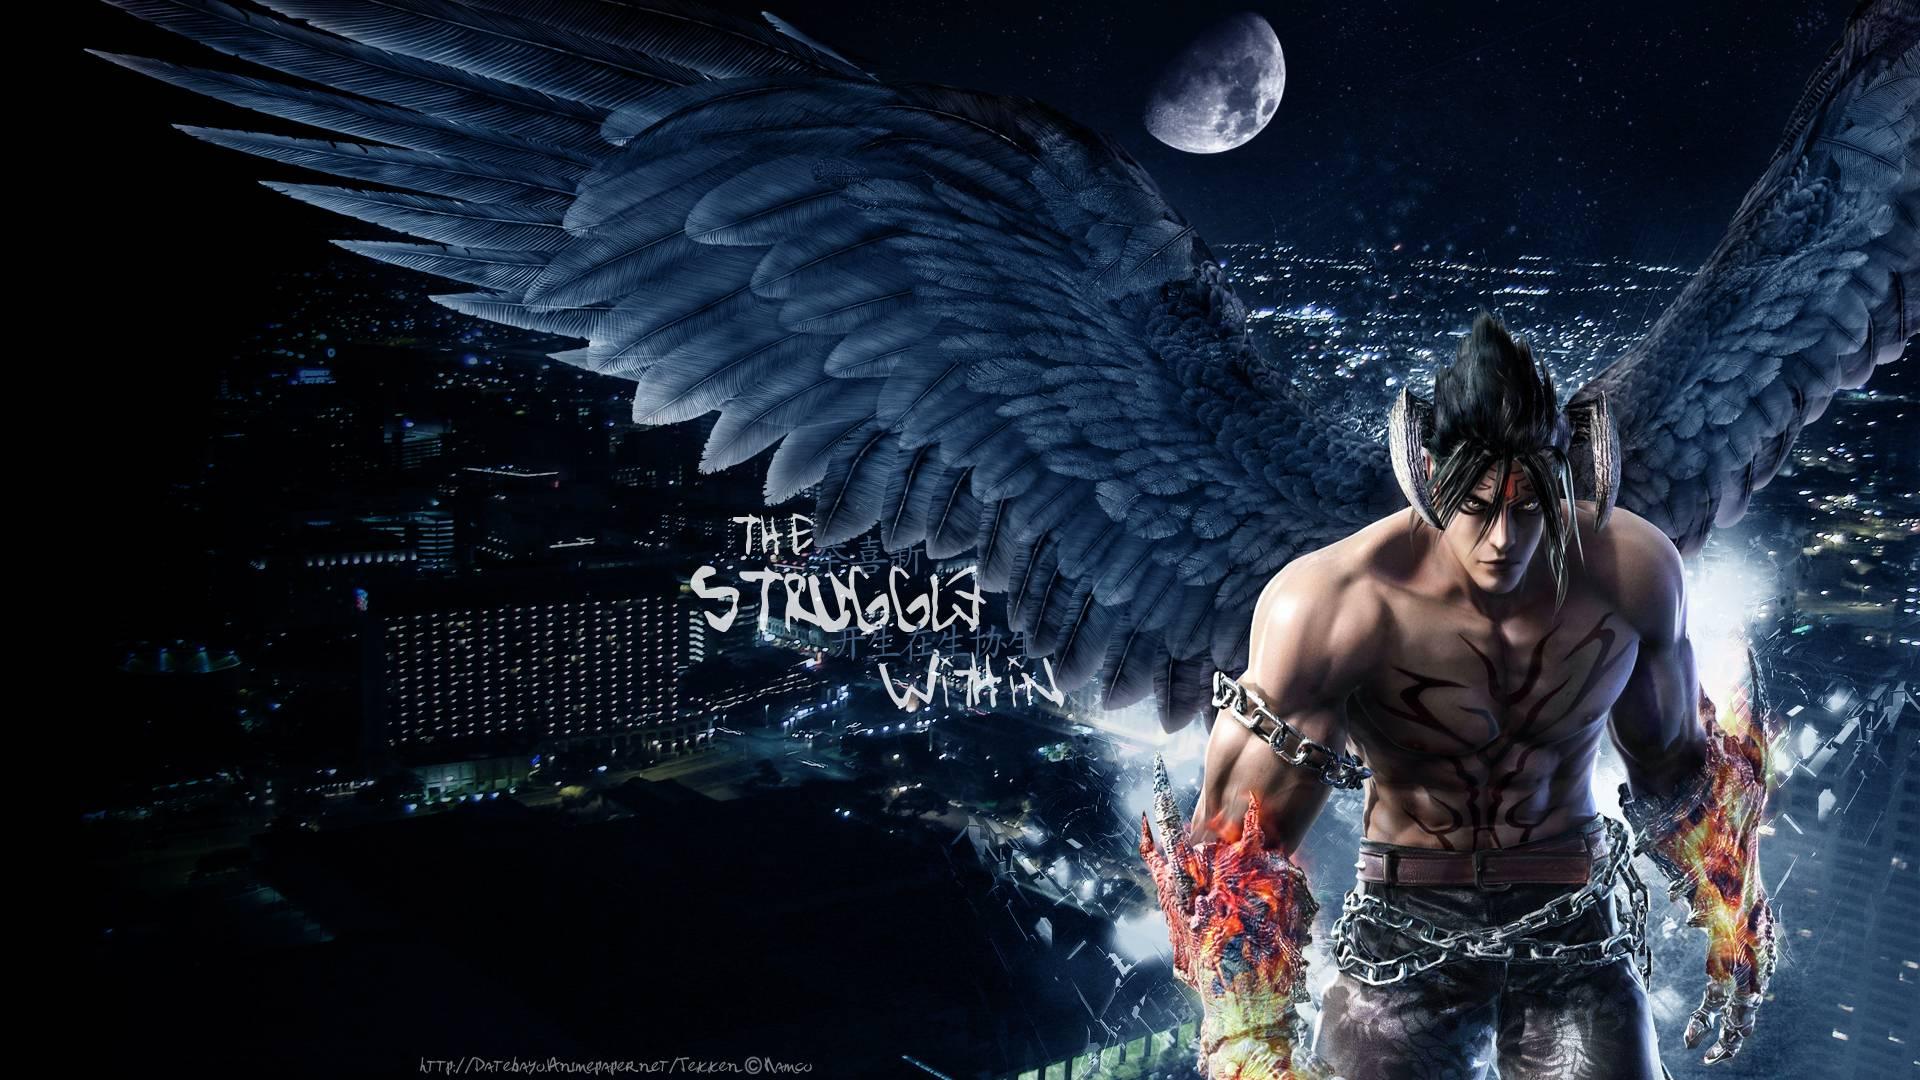 Hd wallpaper cave - Tekken 6 Devil Jin Kazama Hd Wallpaper